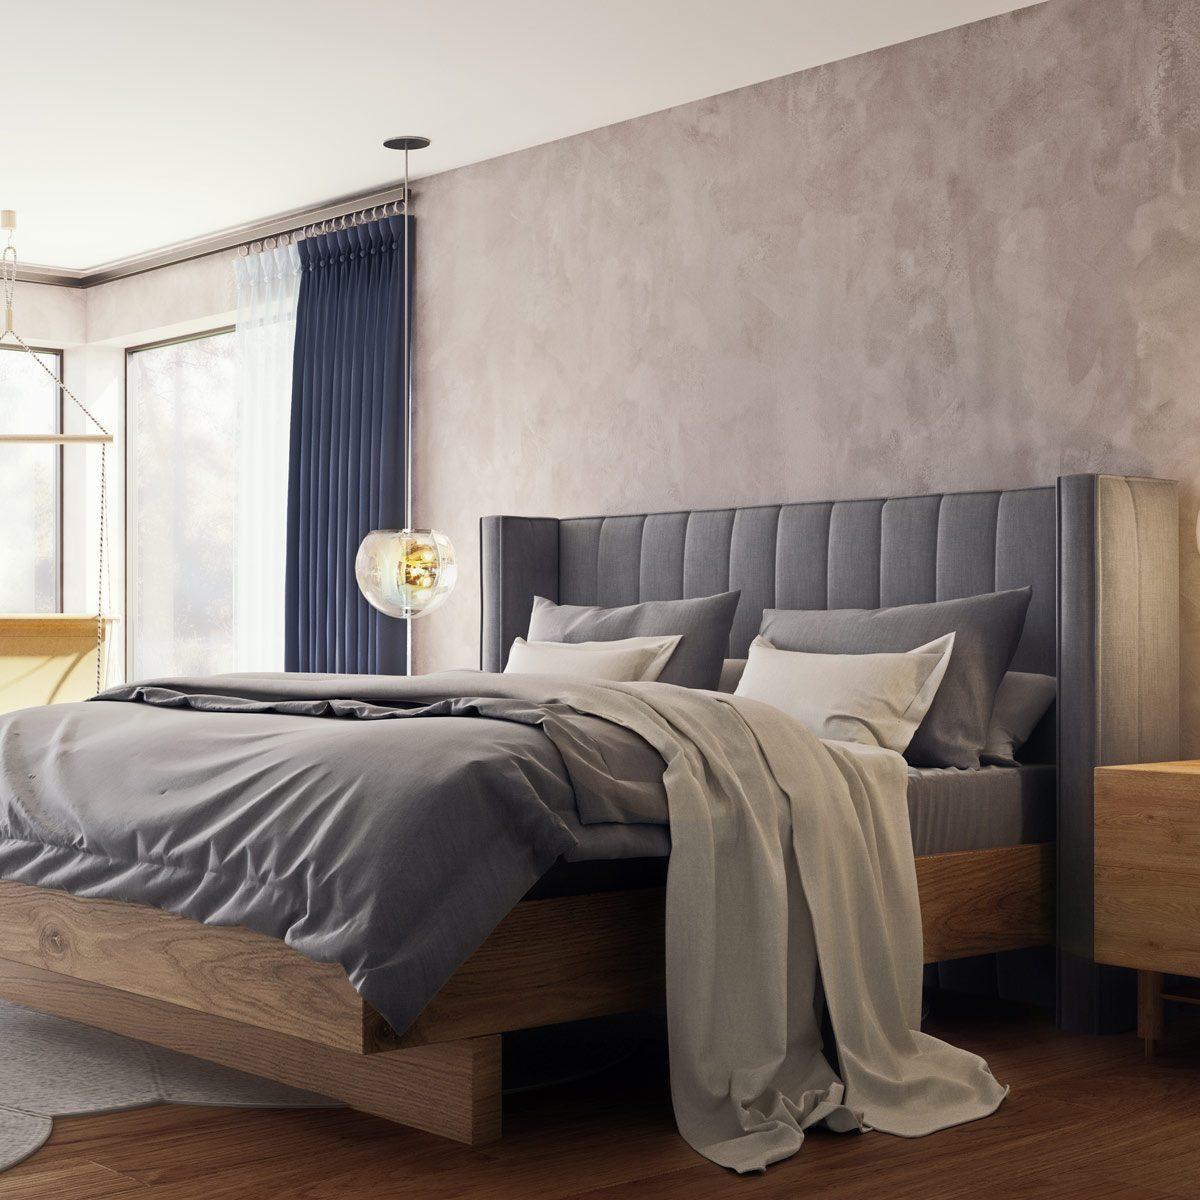 tufted headboard bedroom Gettyimages 1221004812